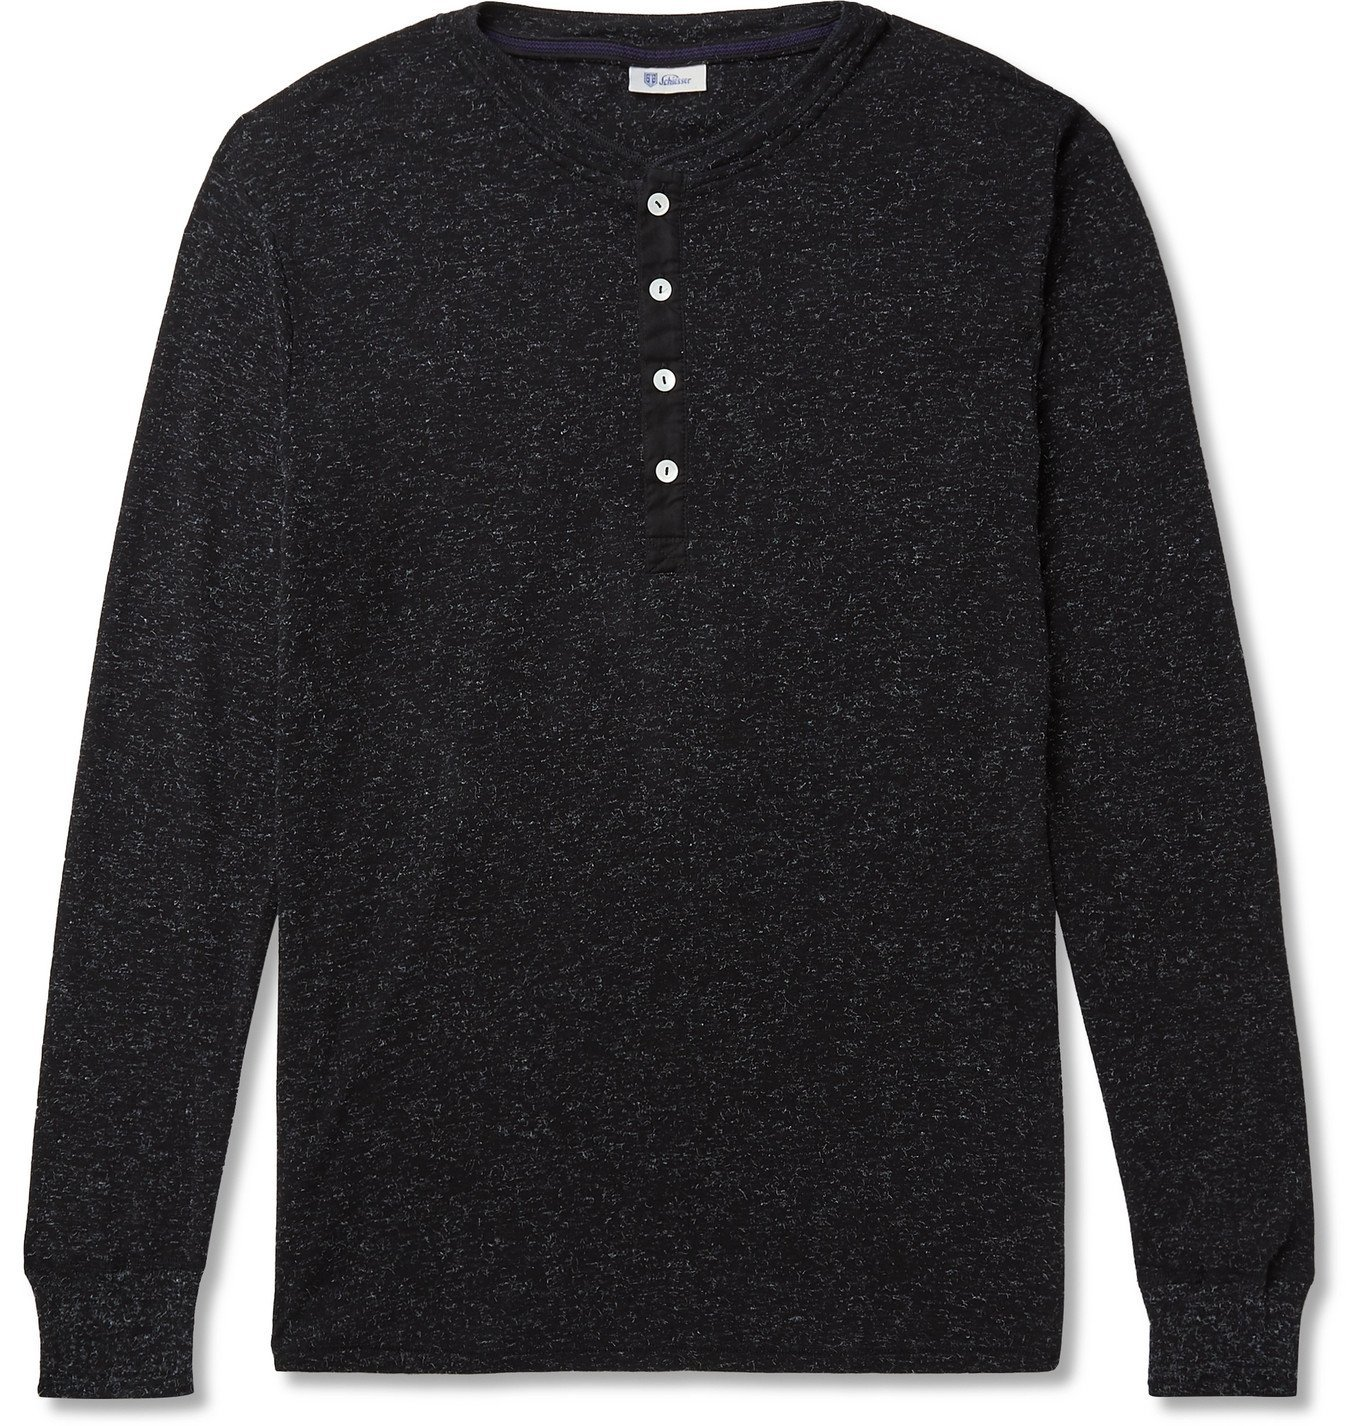 Schiesser - Karl Heinz Mélange Cotton-Blend Jersey Henley T-Shirt - Black